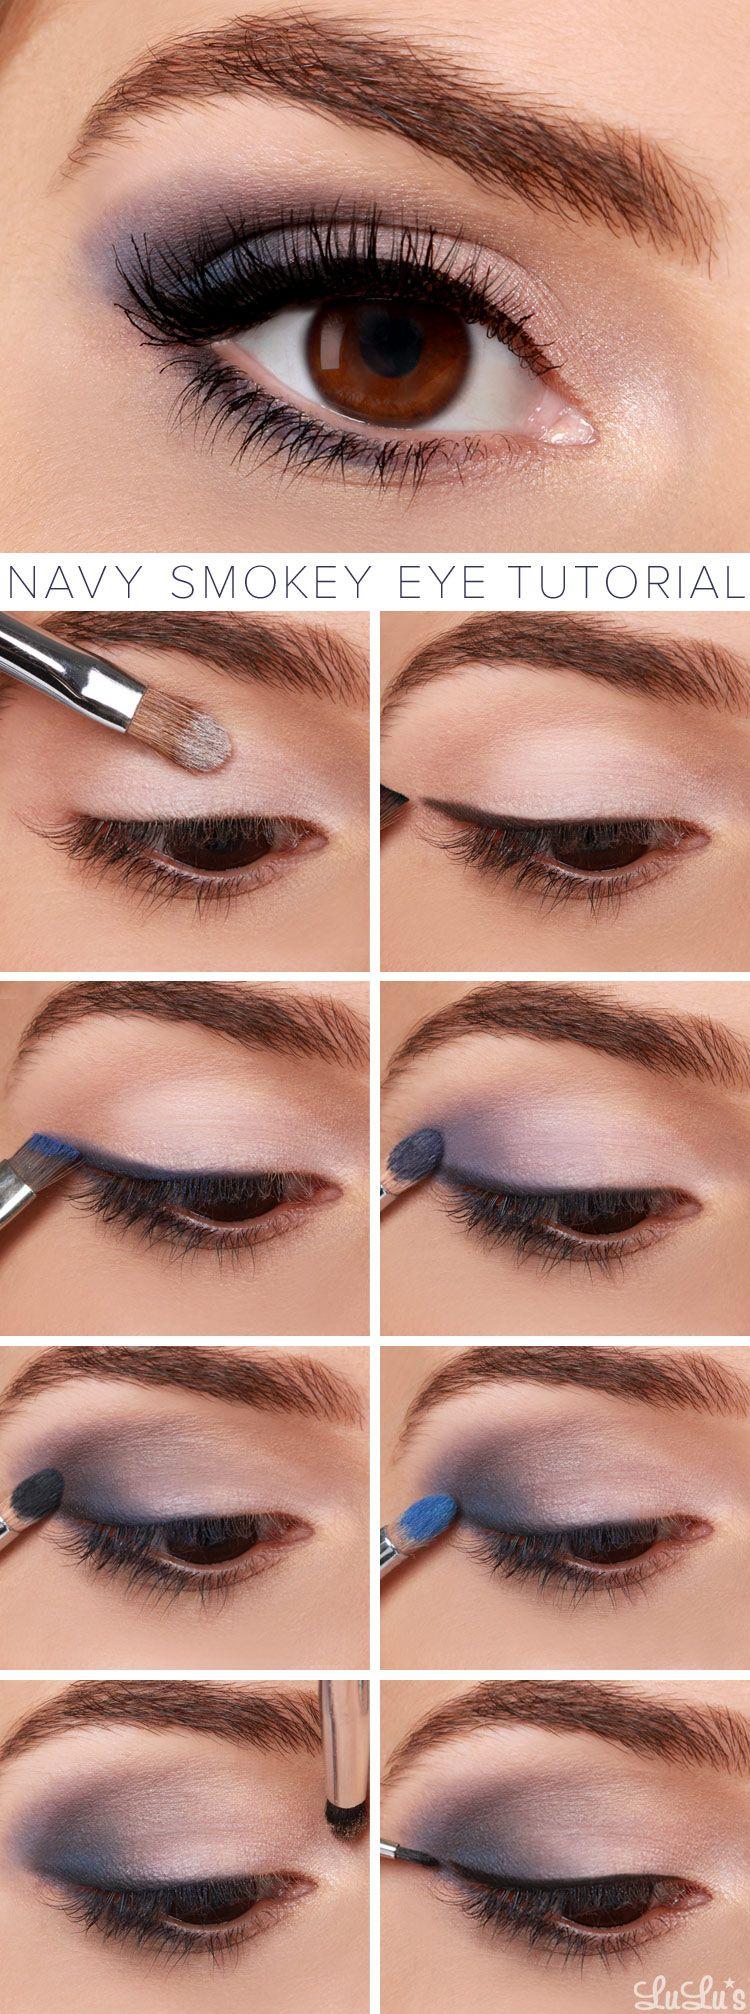 Lulus how to navy smokey eye makeup tutorial smokey eye makeup navy smokey eye makeup tutorial baditri Images